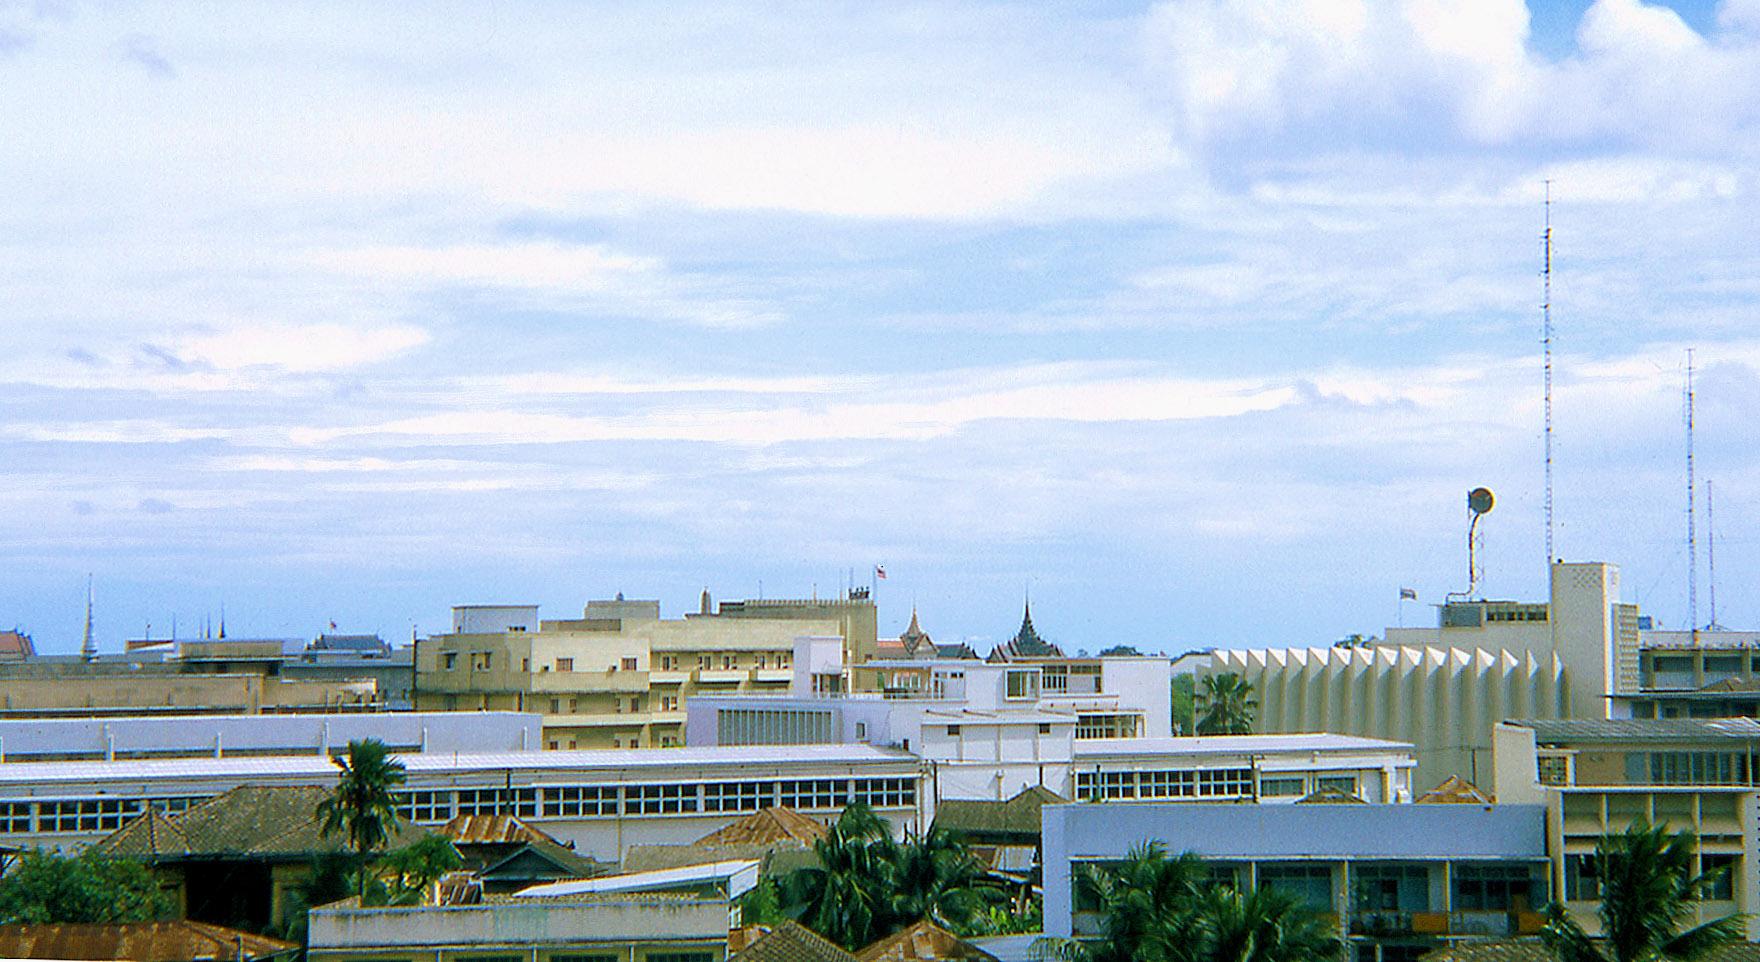 1968 Bangkok Skyline 4 by Harry McCown.jpg